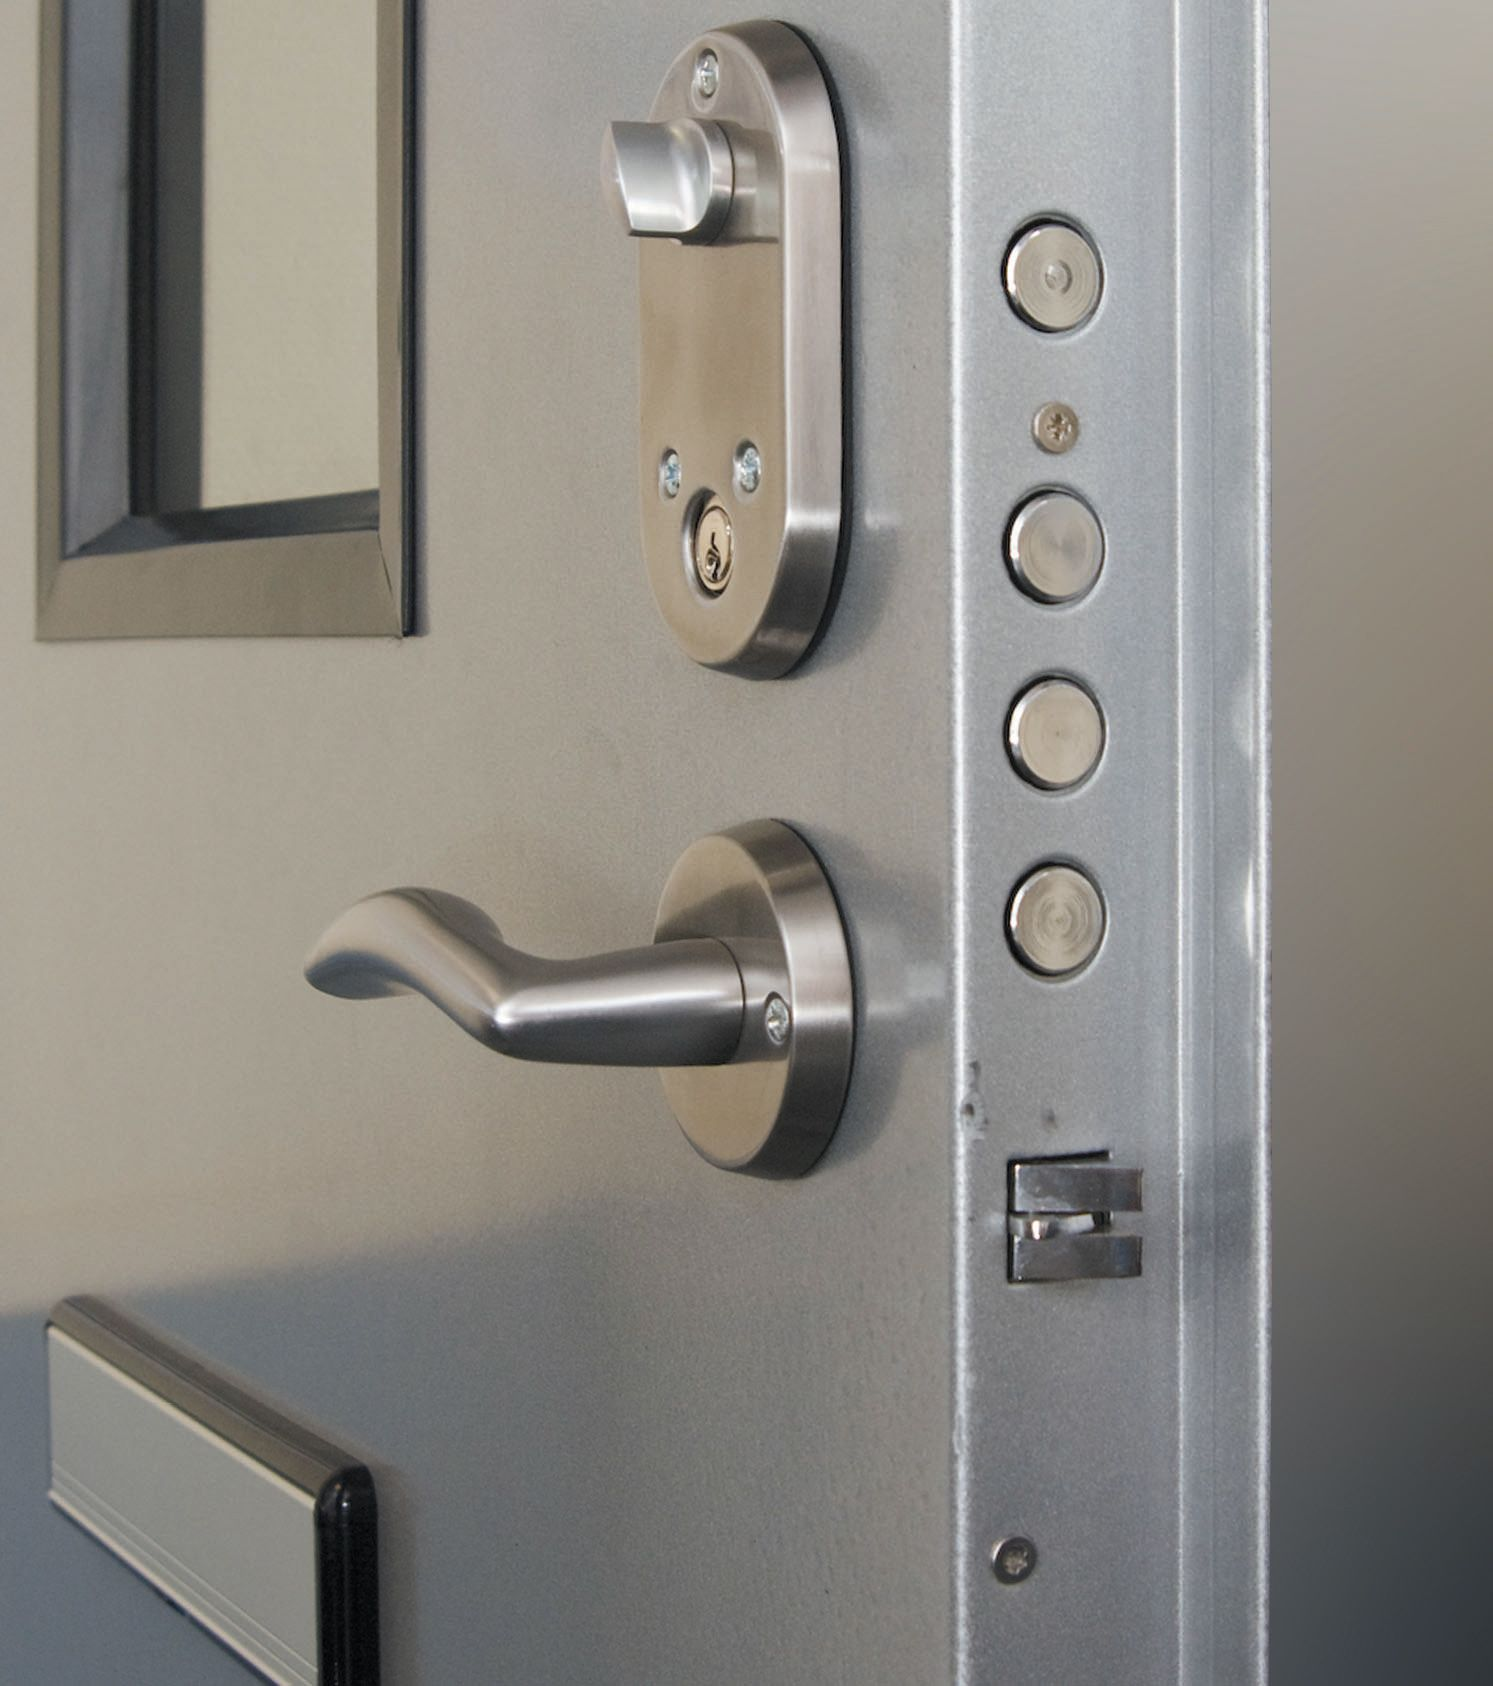 Interior door security systems provide you 24-7 safety & Interior door security systems provide you 24-7 safety | Nice ... Pezcame.Com